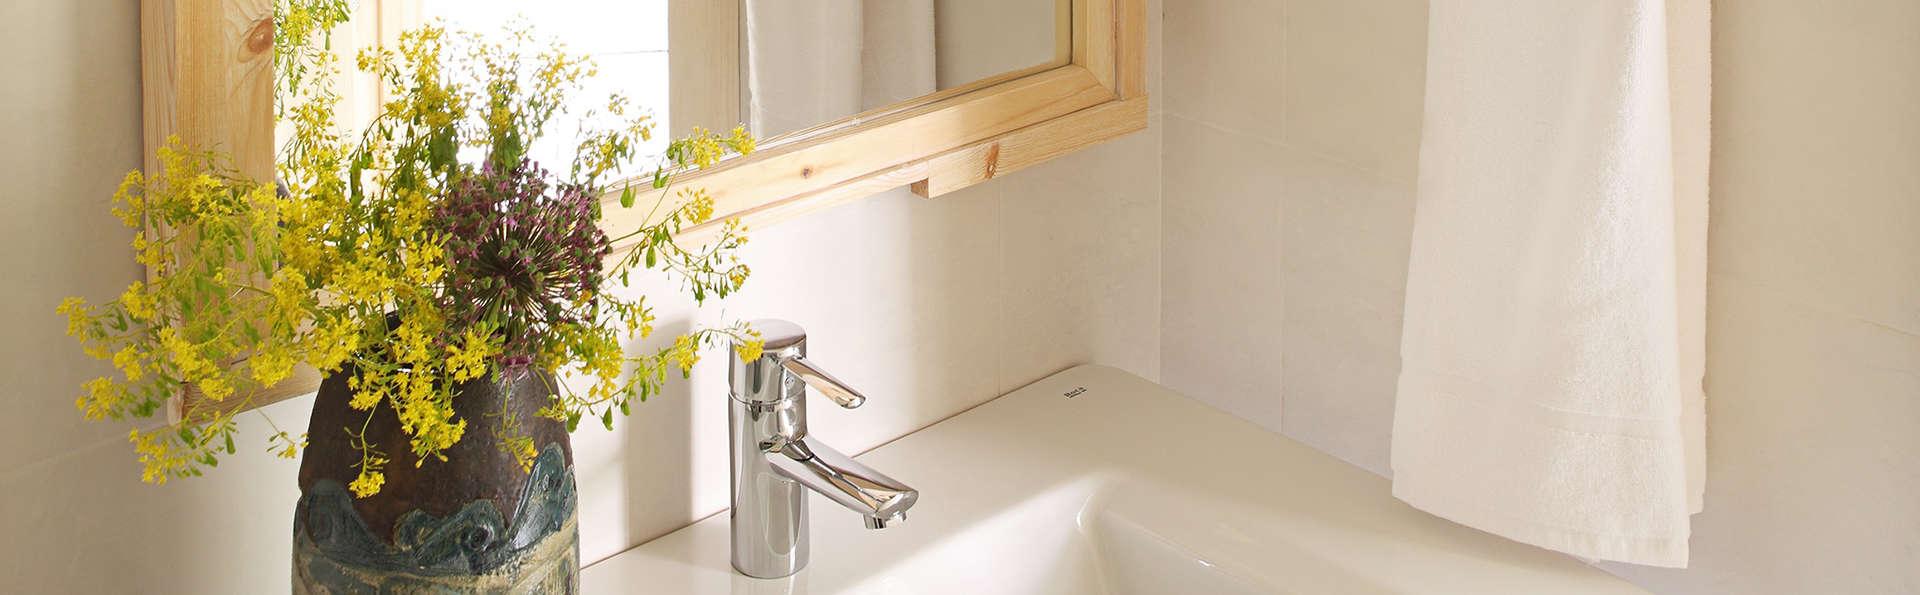 Artesa Suites & Spa (Adults Only) - Edit_Bathroom3.jpg